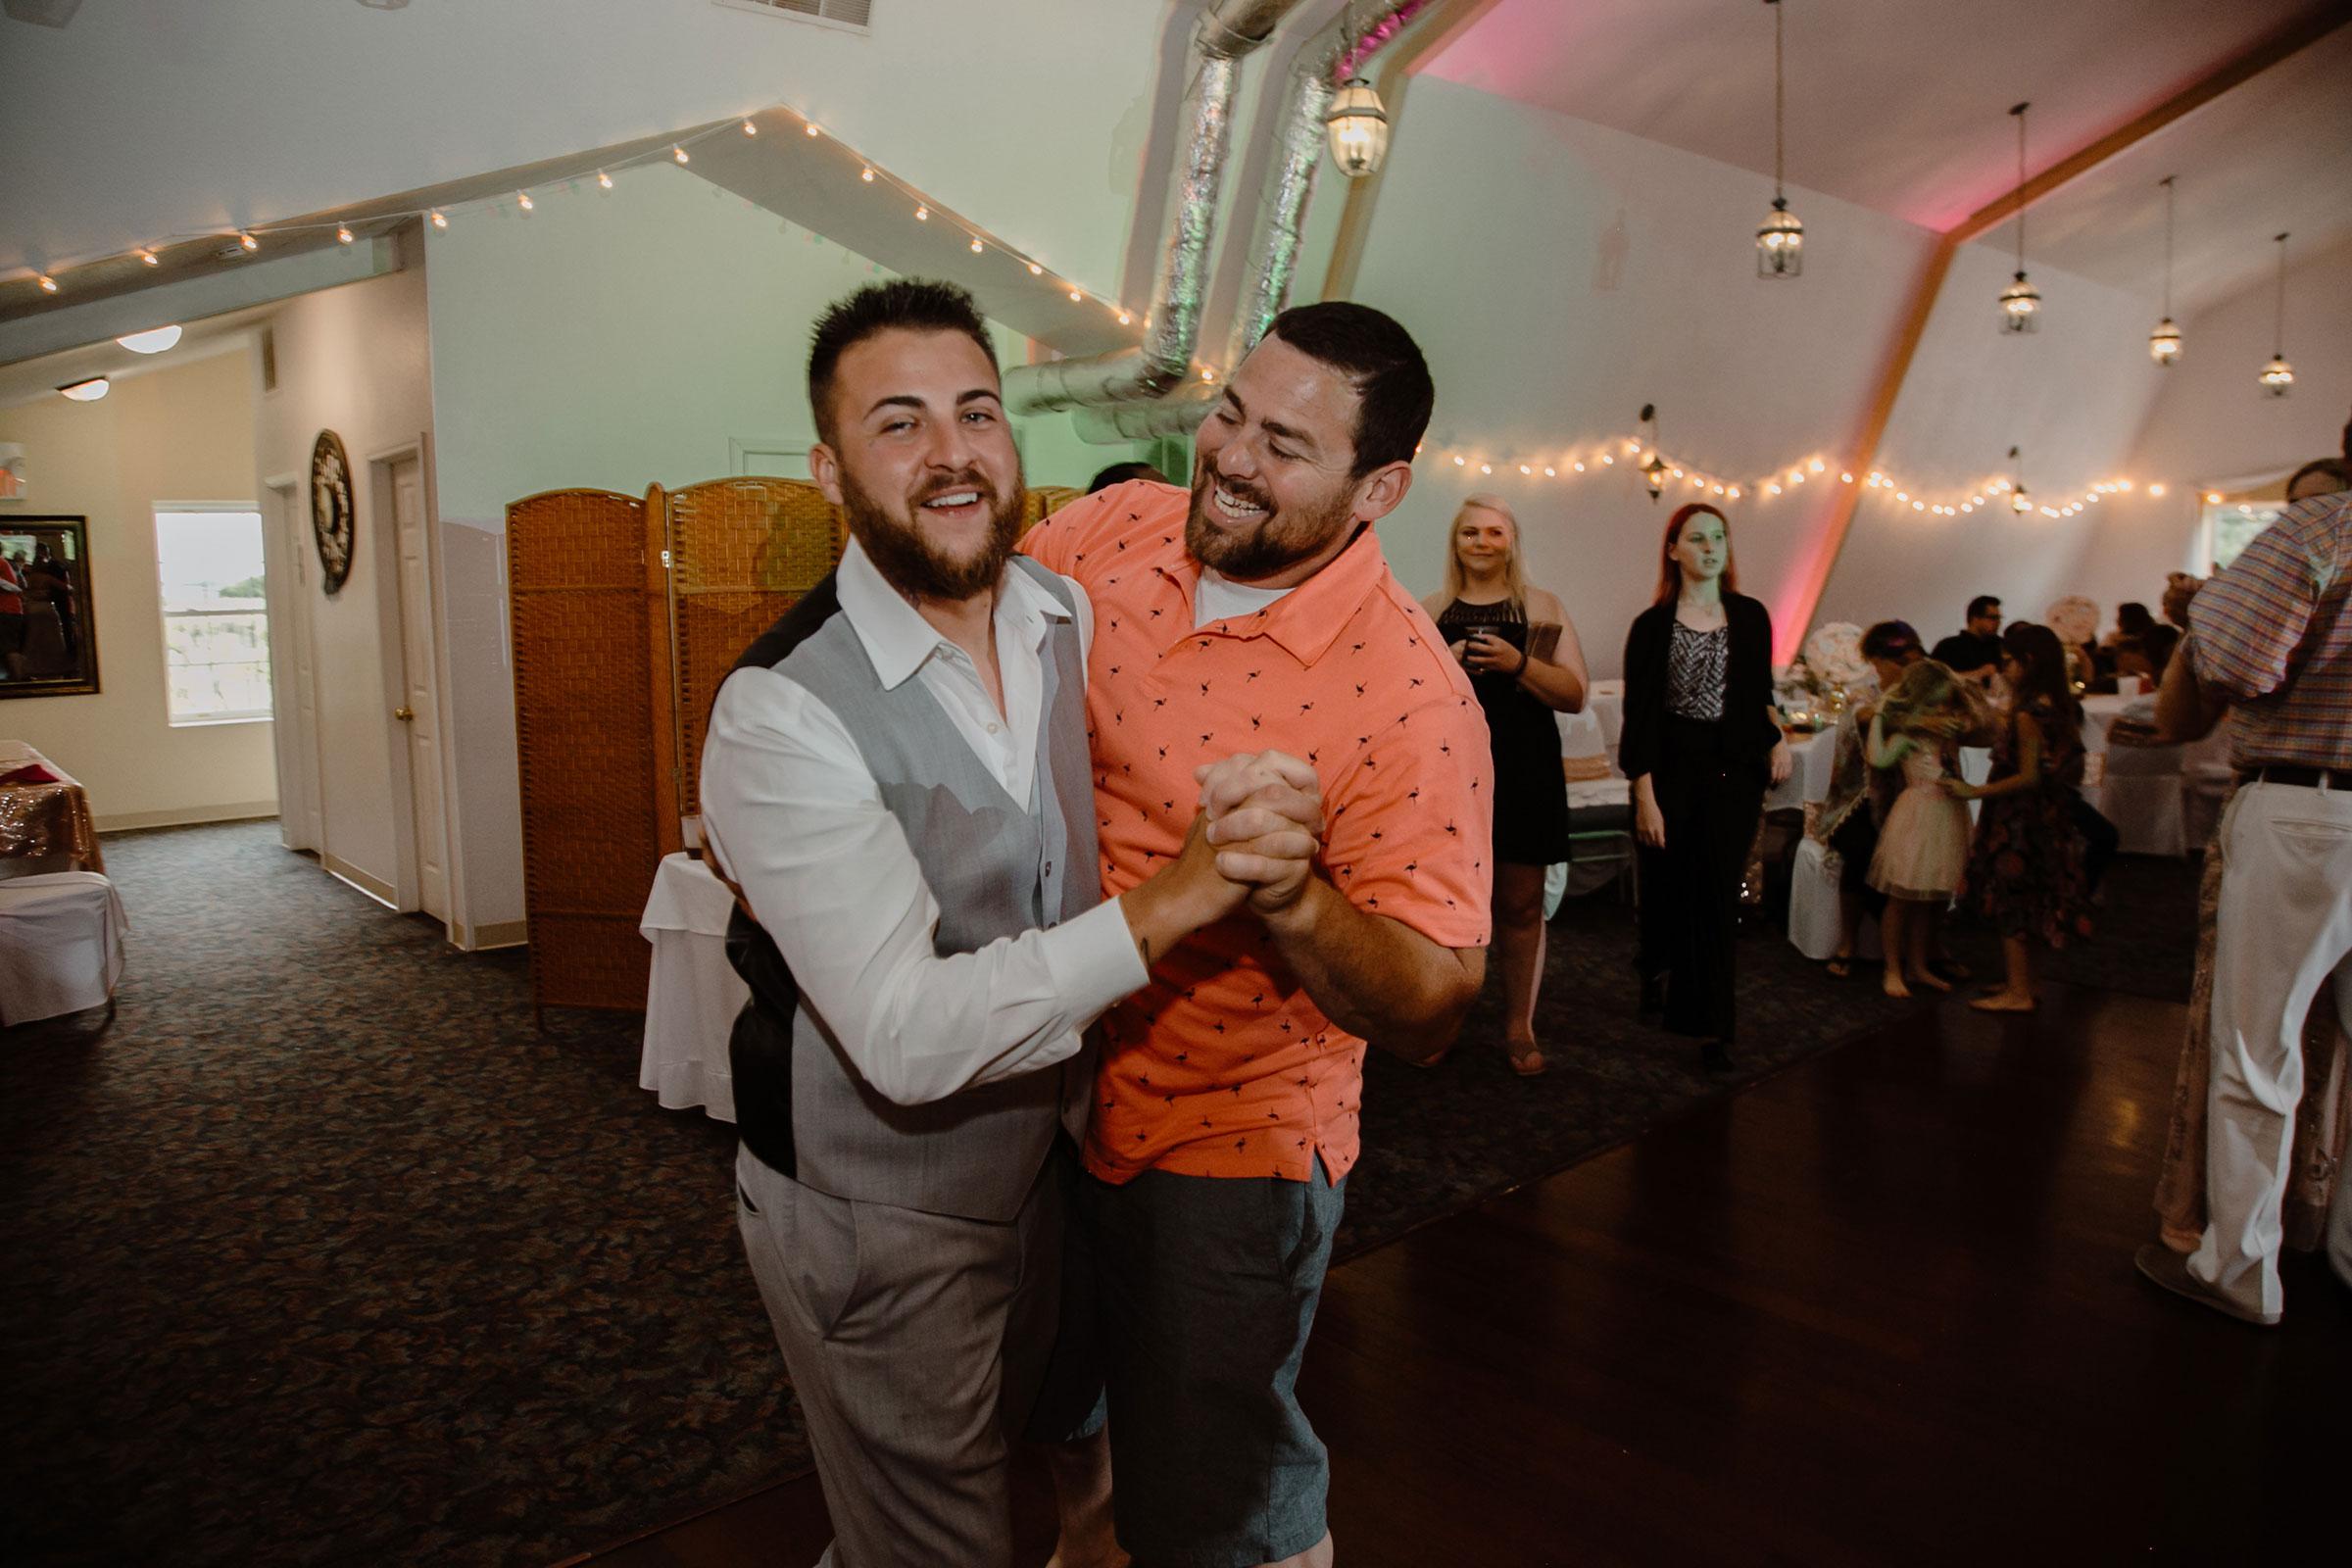 groom-dancing-with-friend-wedding-summerset-winery-indianola-iowa-raelyn-ramey-photography.jpg